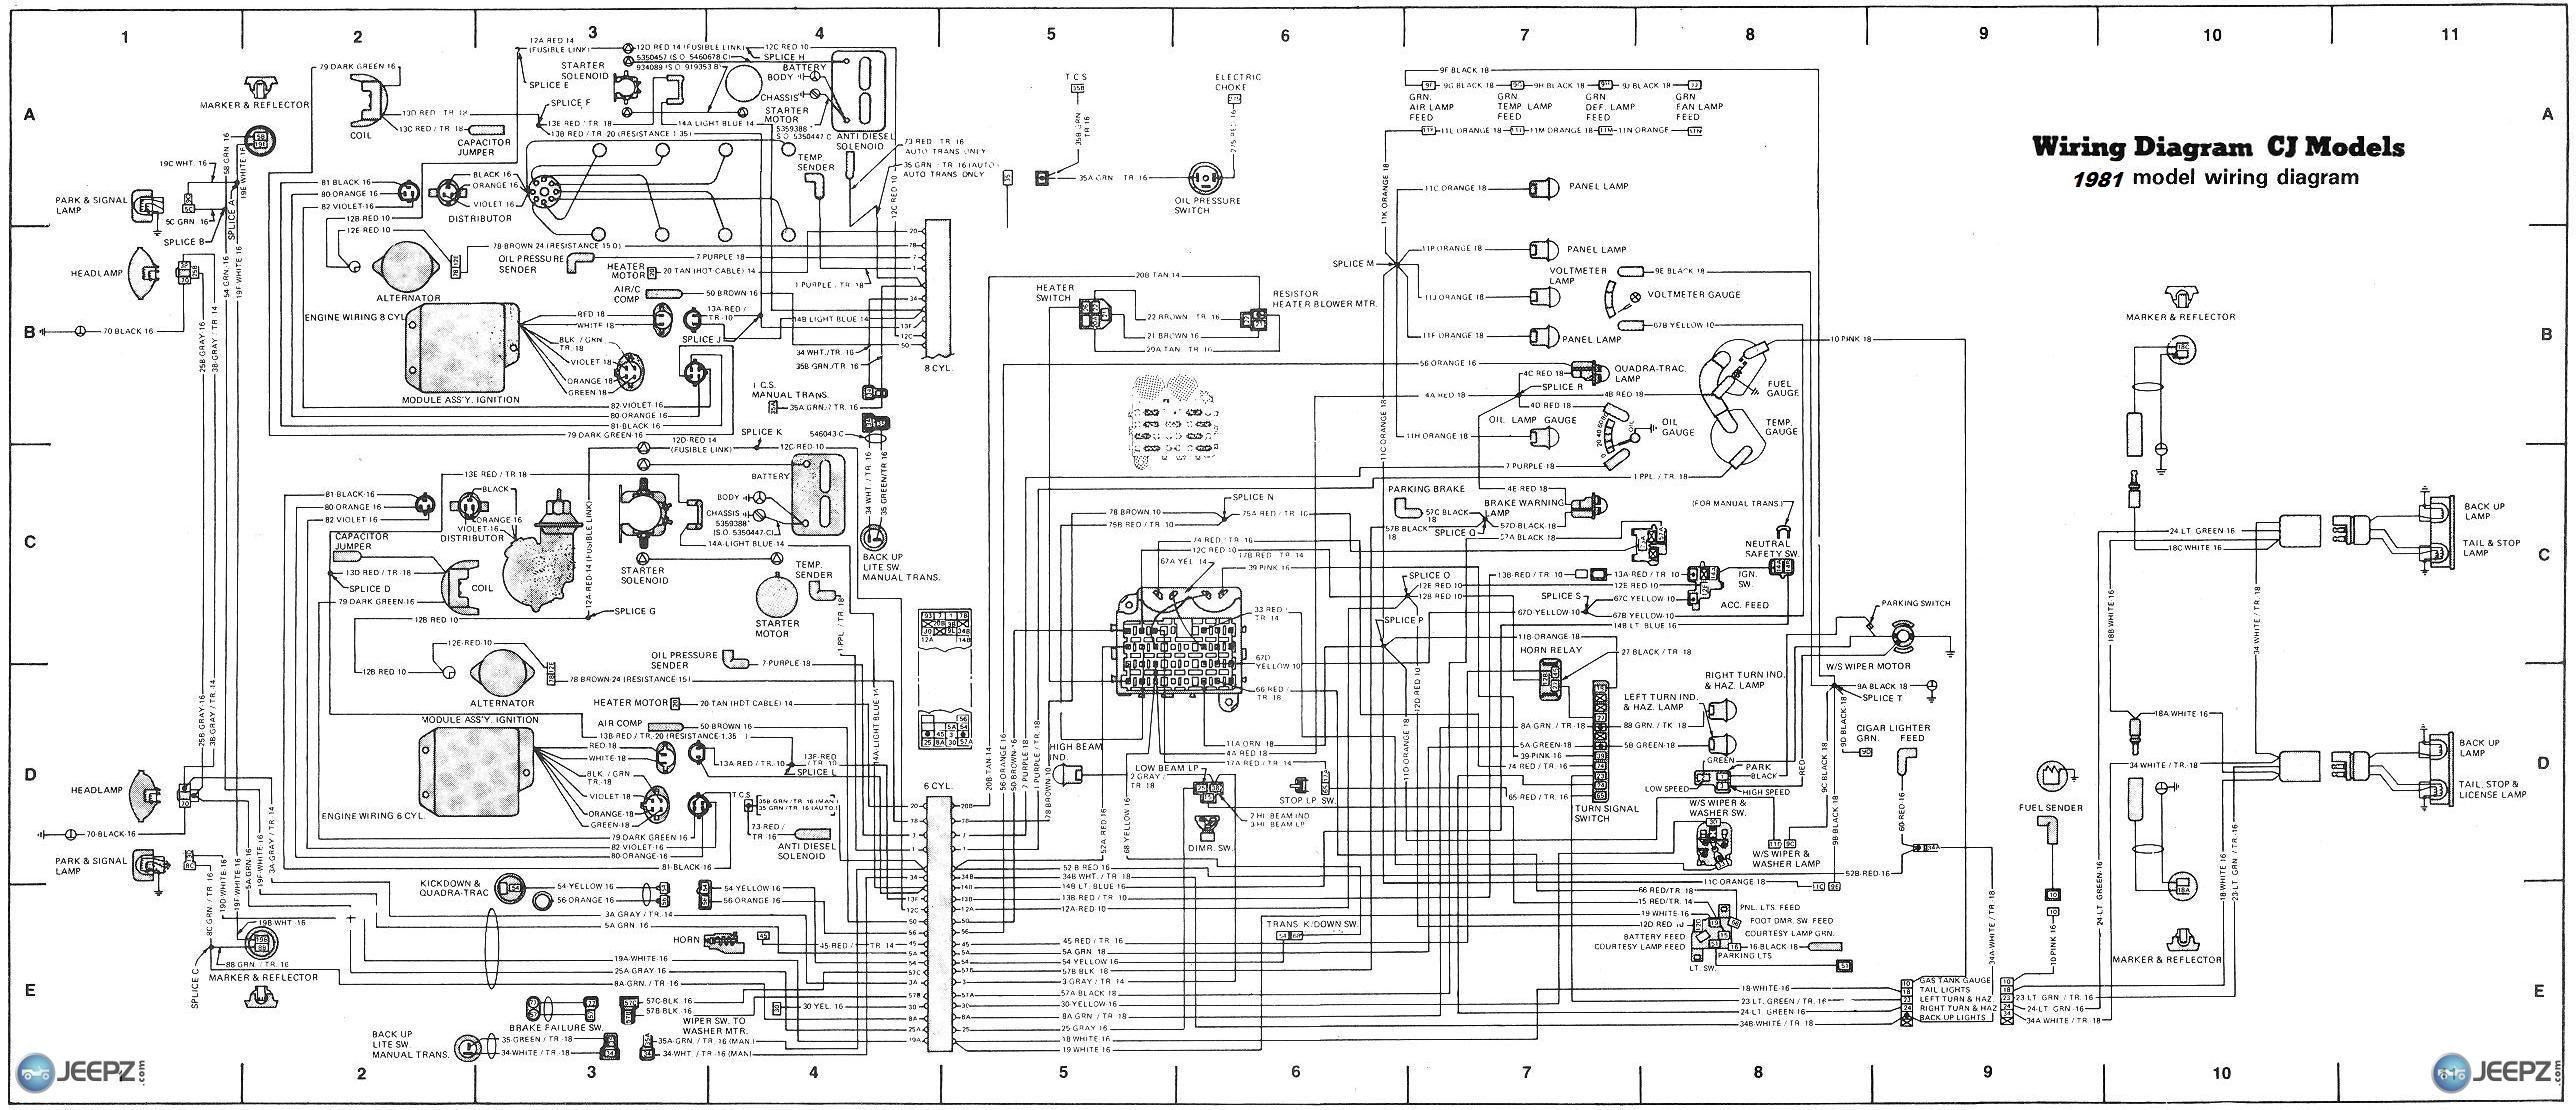 Wondrous Cj7 Painless Wiring Diagram Online Wiring Diagram Wiring Cloud Timewinrebemohammedshrineorg